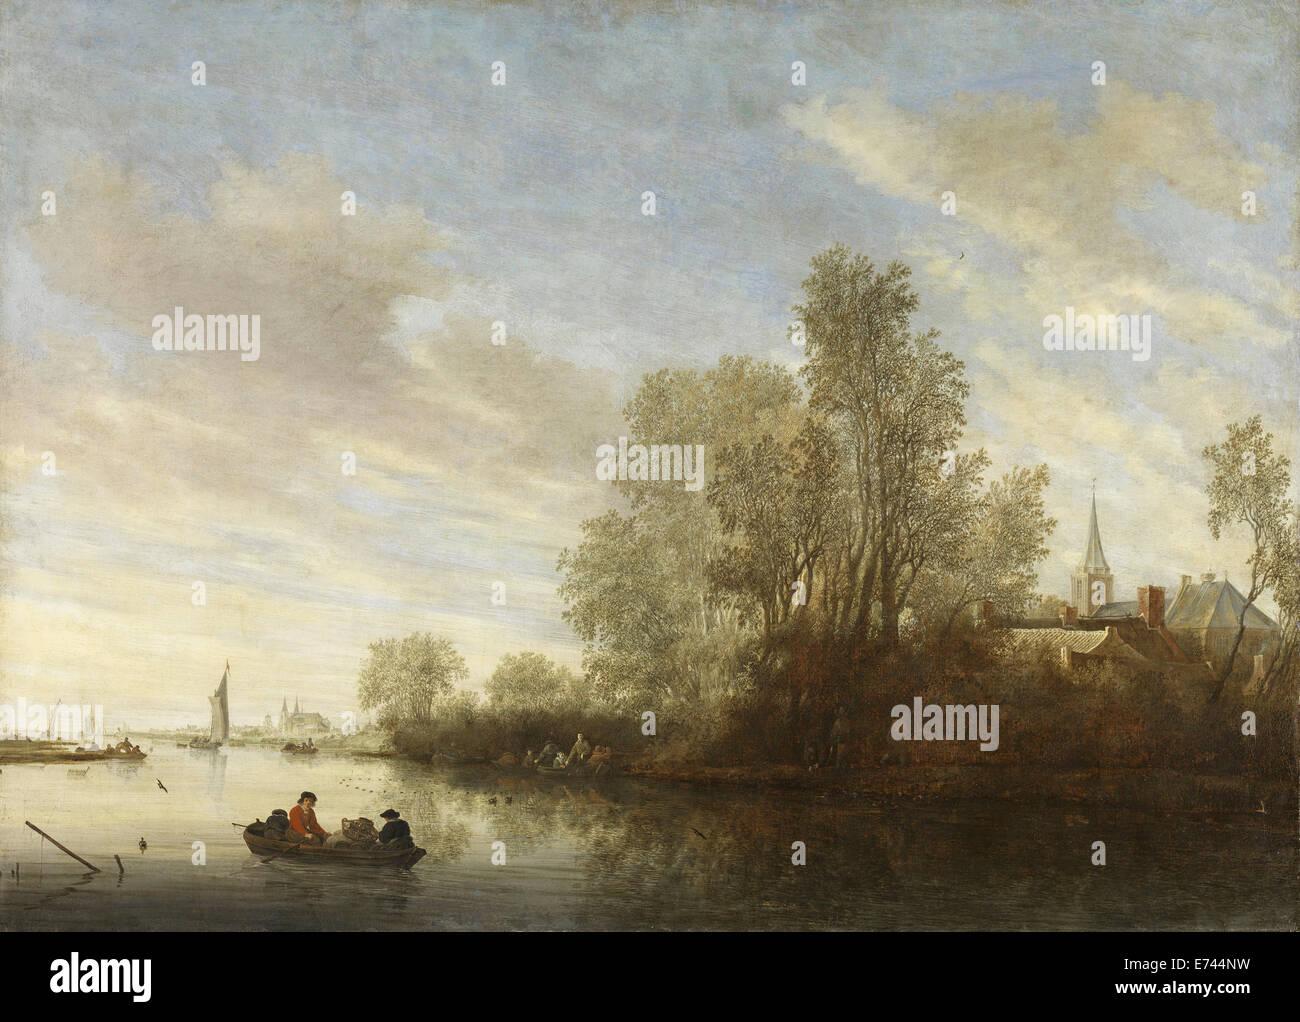 River scene at Deventer - by Salomon van Ruysdael, 1645 Stock Photo